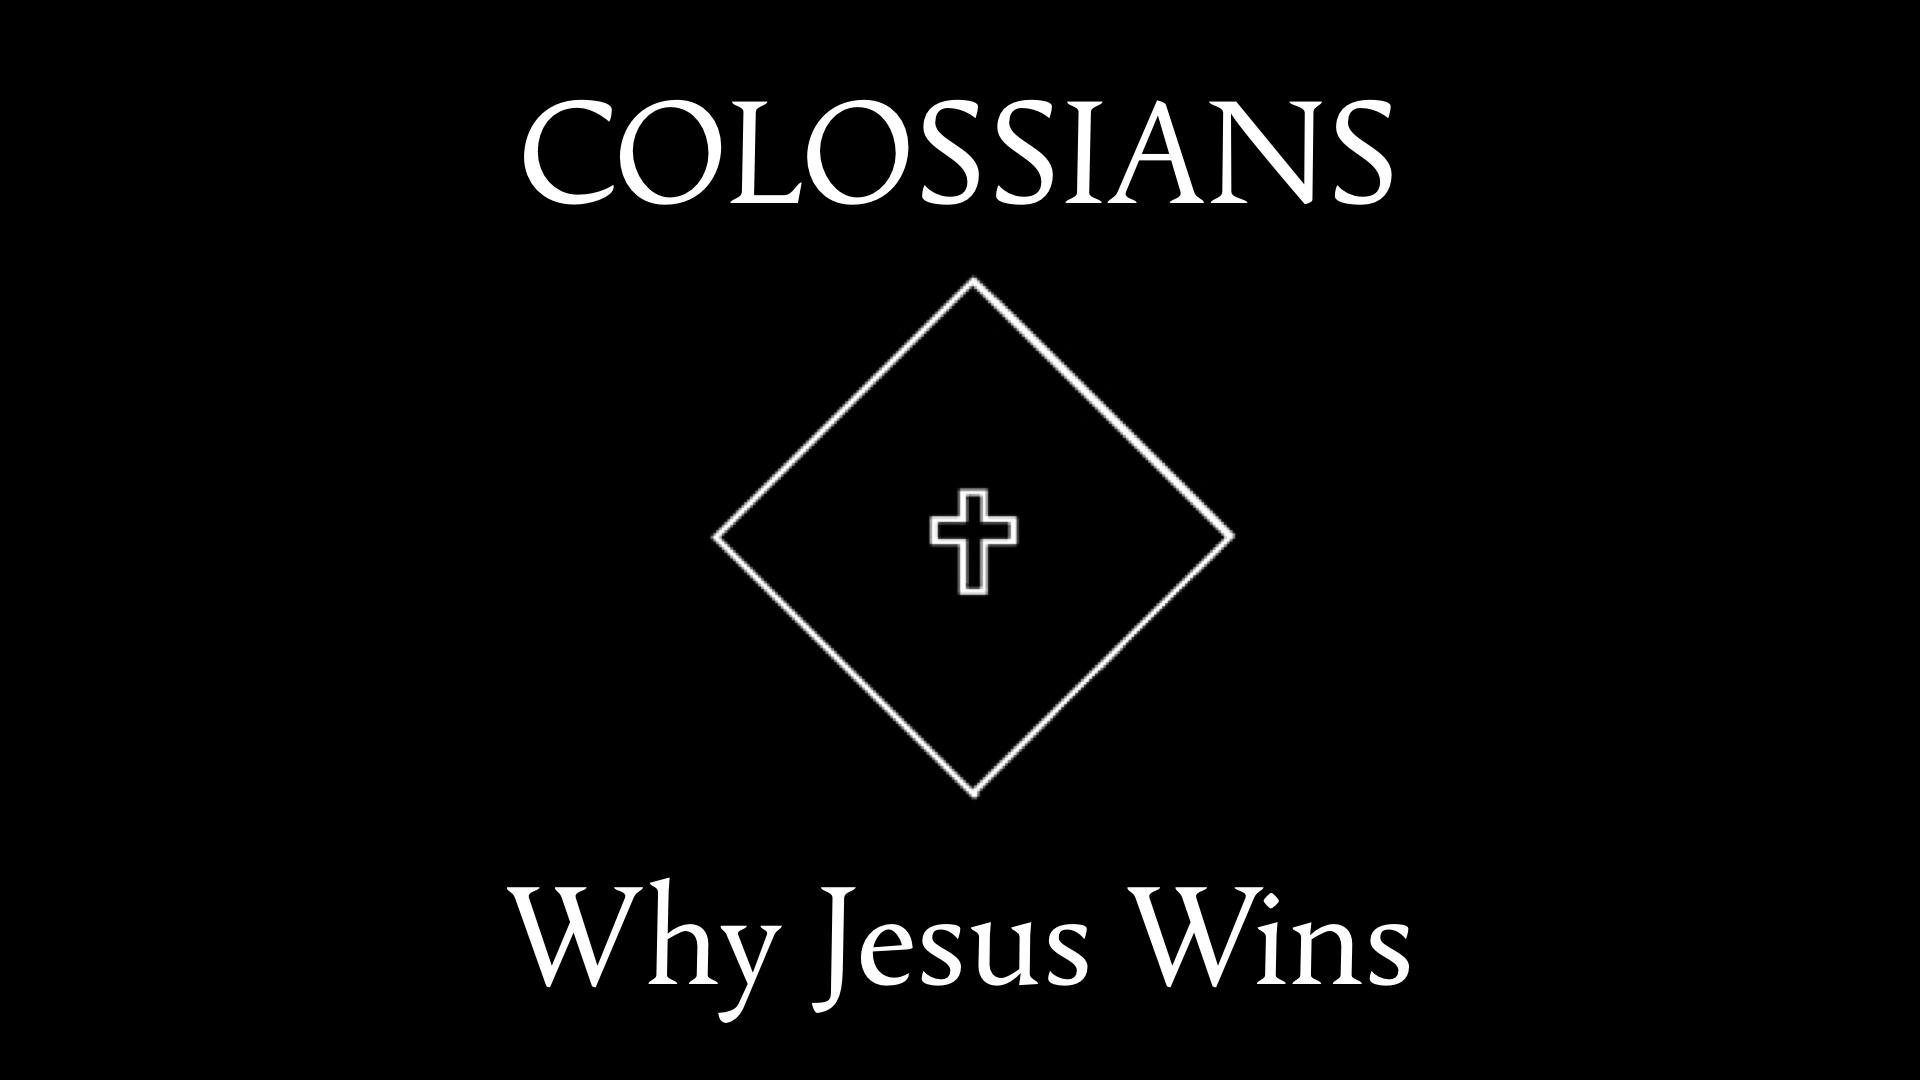 Colossians title.jpeg